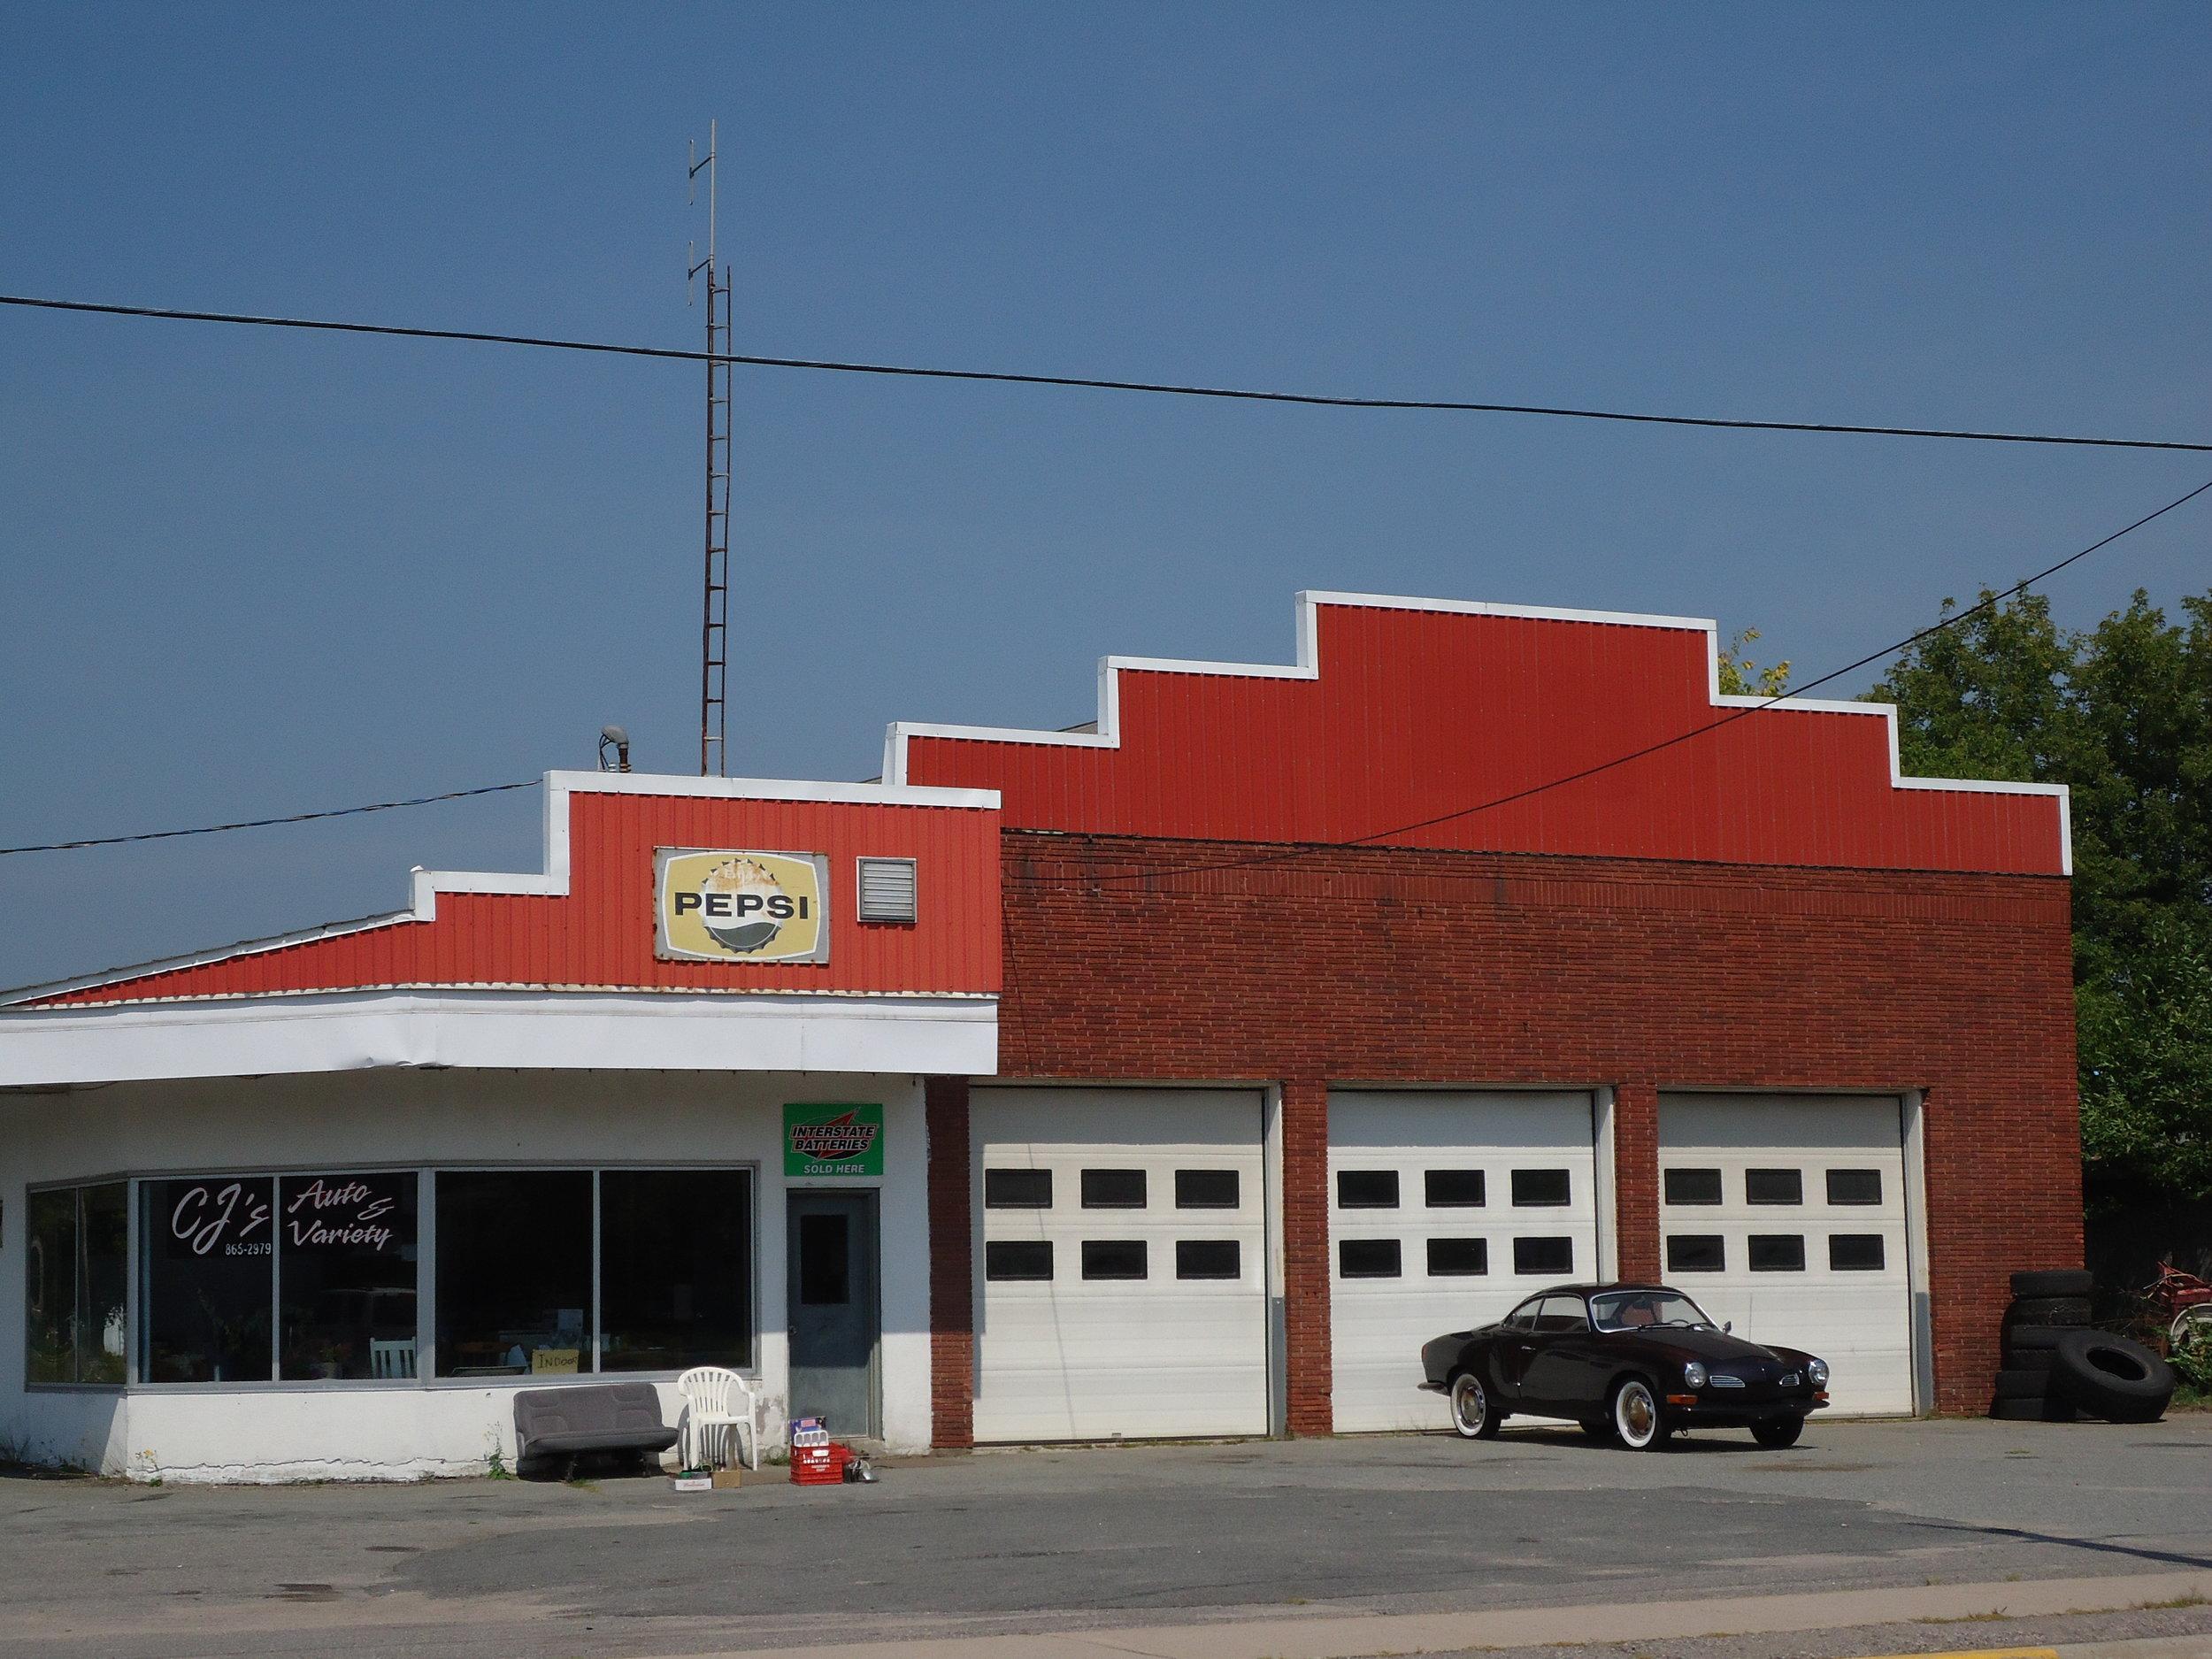 CJ's, northern Ontario, 08.2012